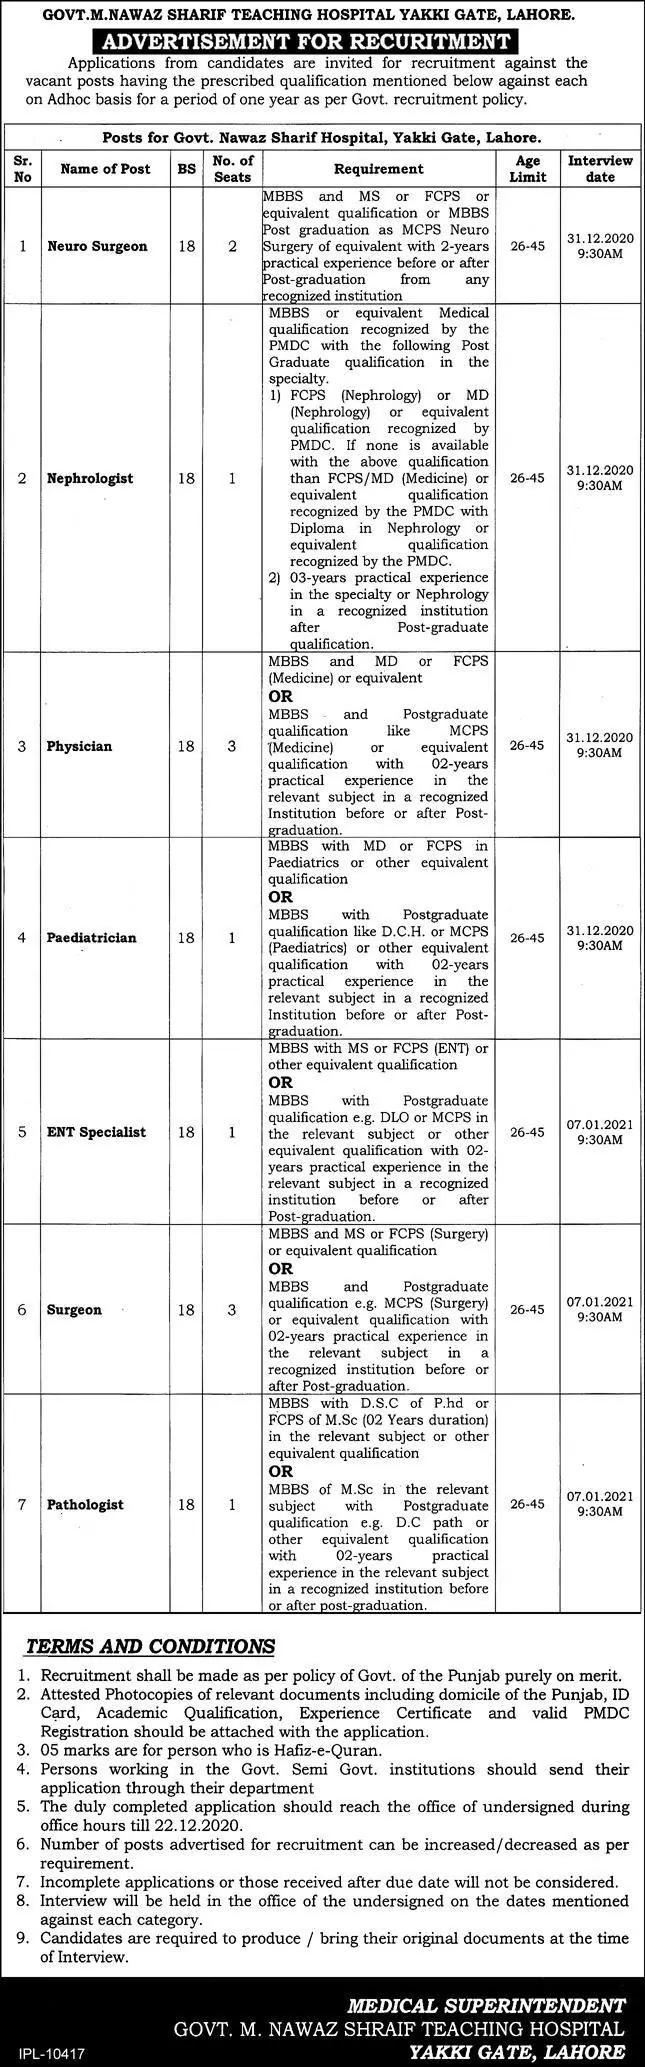 Nawaz Sharif Teaching Hospital Lahore Jobs 2020